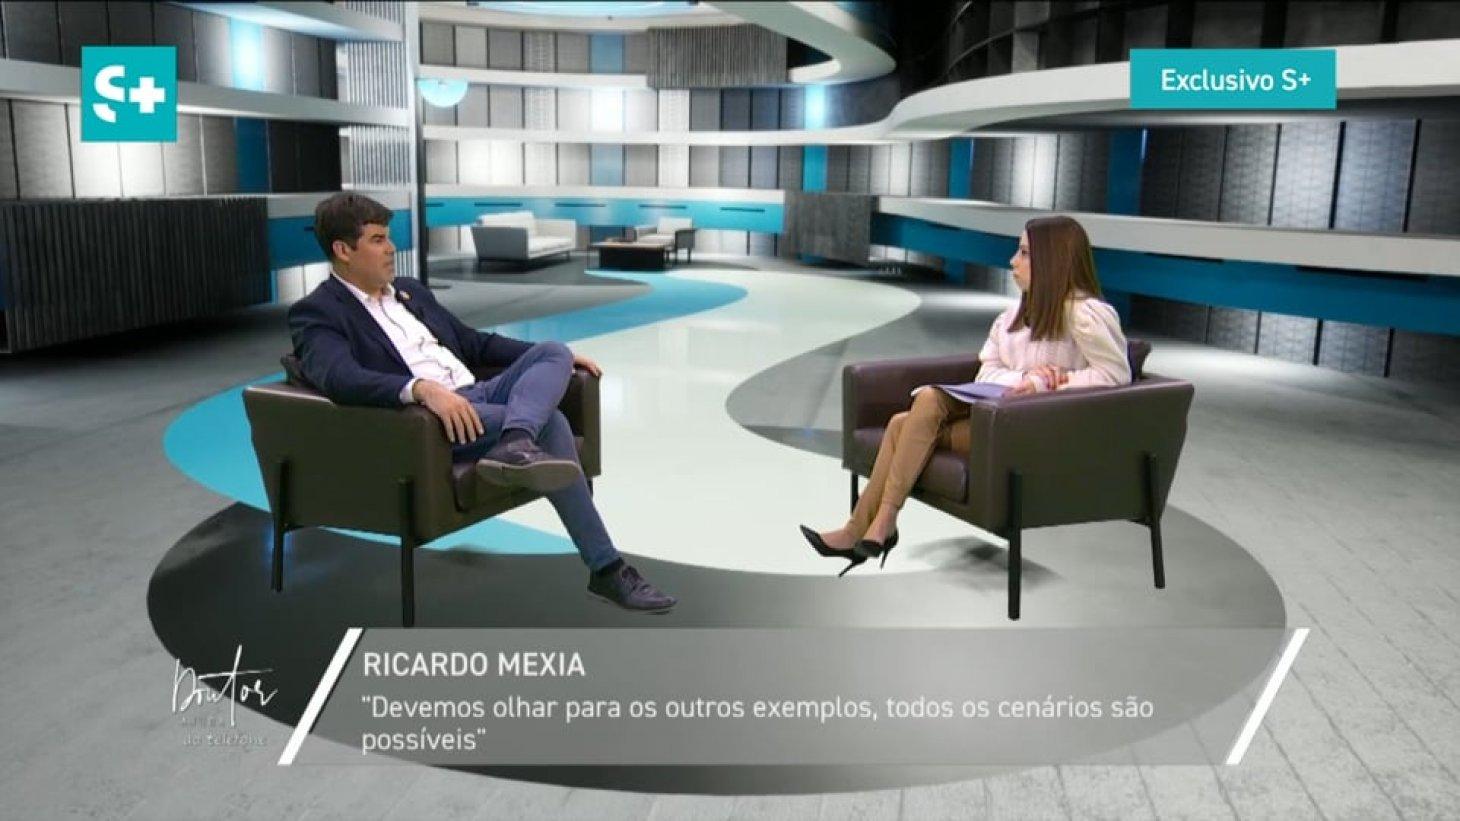 Ricardo Mexia #9